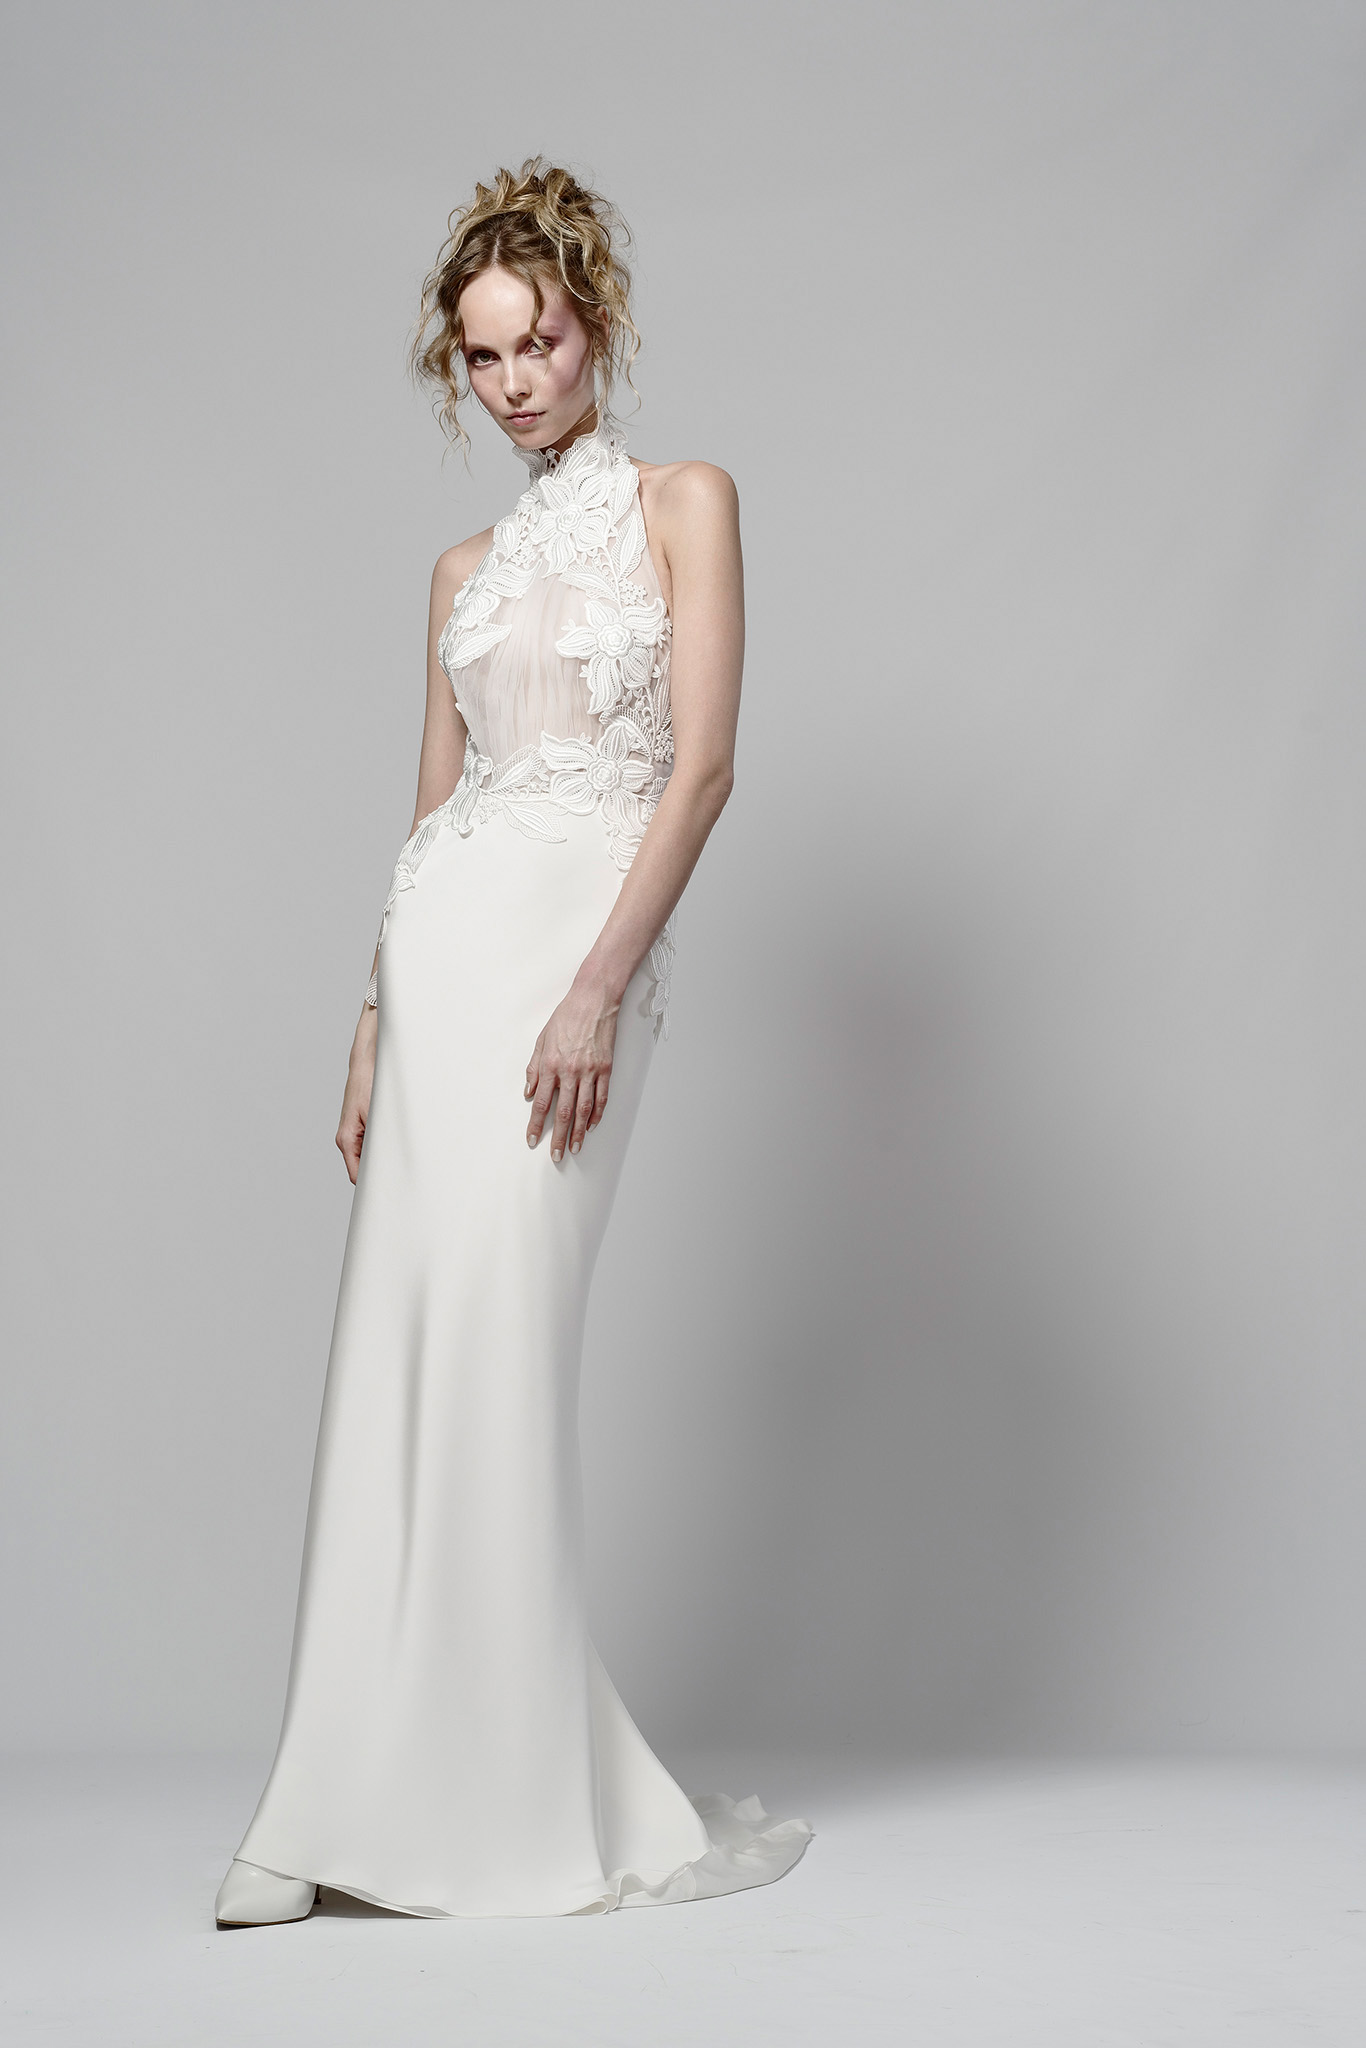 c3eac6cfd89b Elizabeth Fillmore Aster wedding dress - Browns Bride